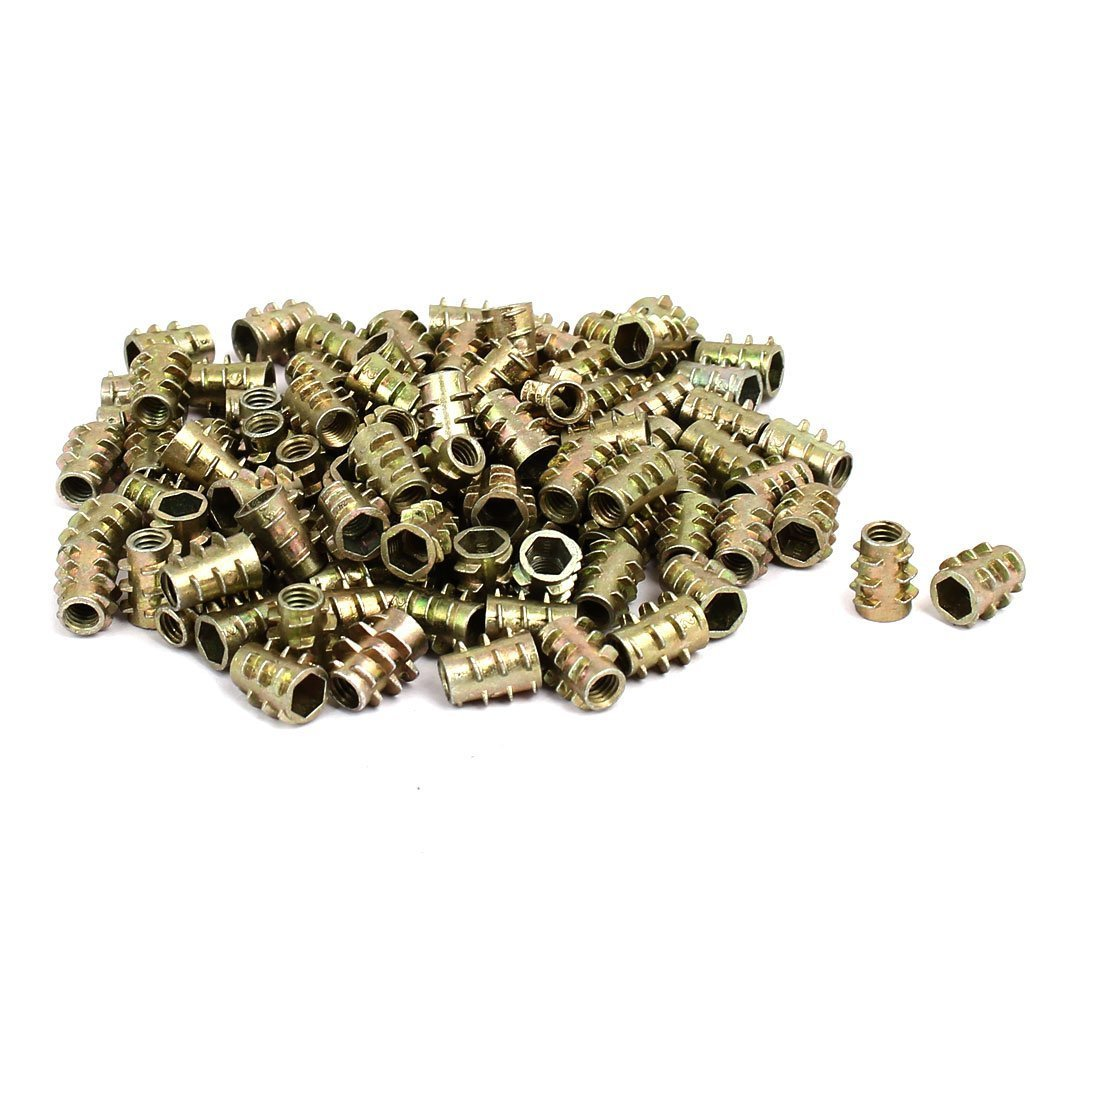 sourcingmap® M4x10mm allen tuercas inserto roscado de tonos bronce 100pcs para muebles de madera a16103100ux1032